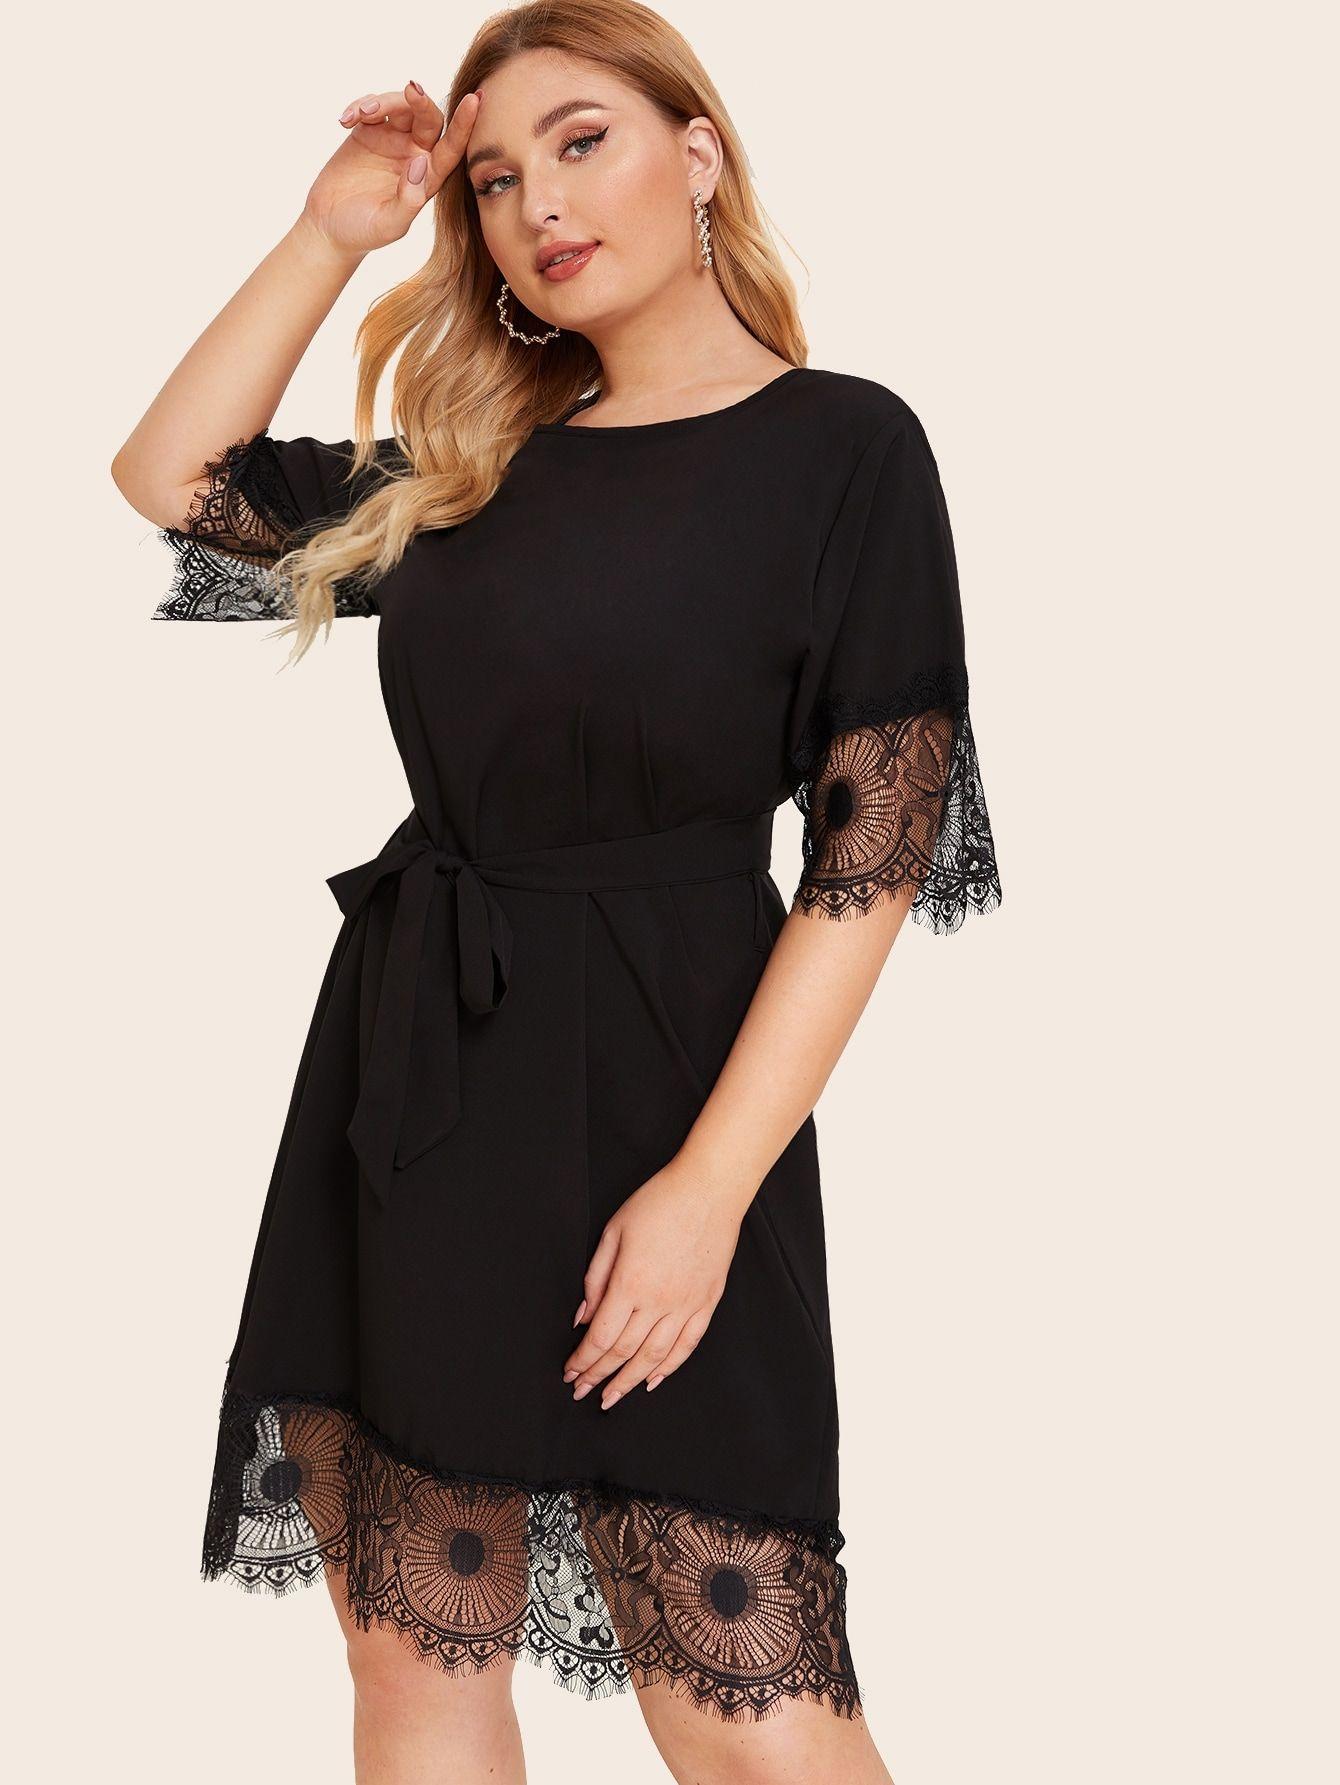 Ad Plus Contrast Eyelash Lace Self Tie Dress Tags Elegant Black Plain Round Neck Short Tunic Belt Occasion Maxi Dresses Curvy Dress Mesh Sleeved Dress [ 1785 x 1340 Pixel ]